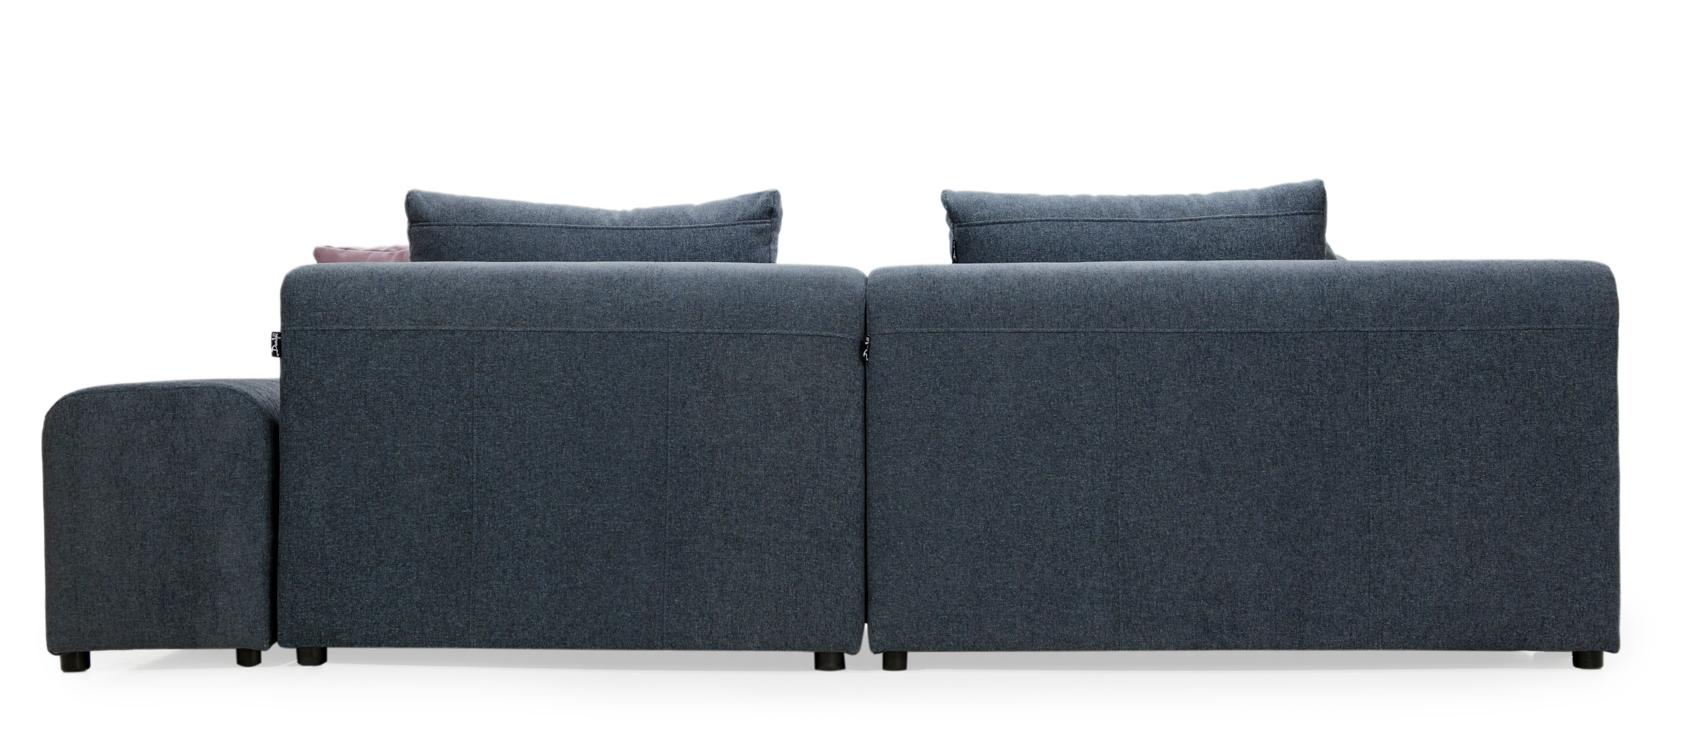 Sofa RAFT фото 14